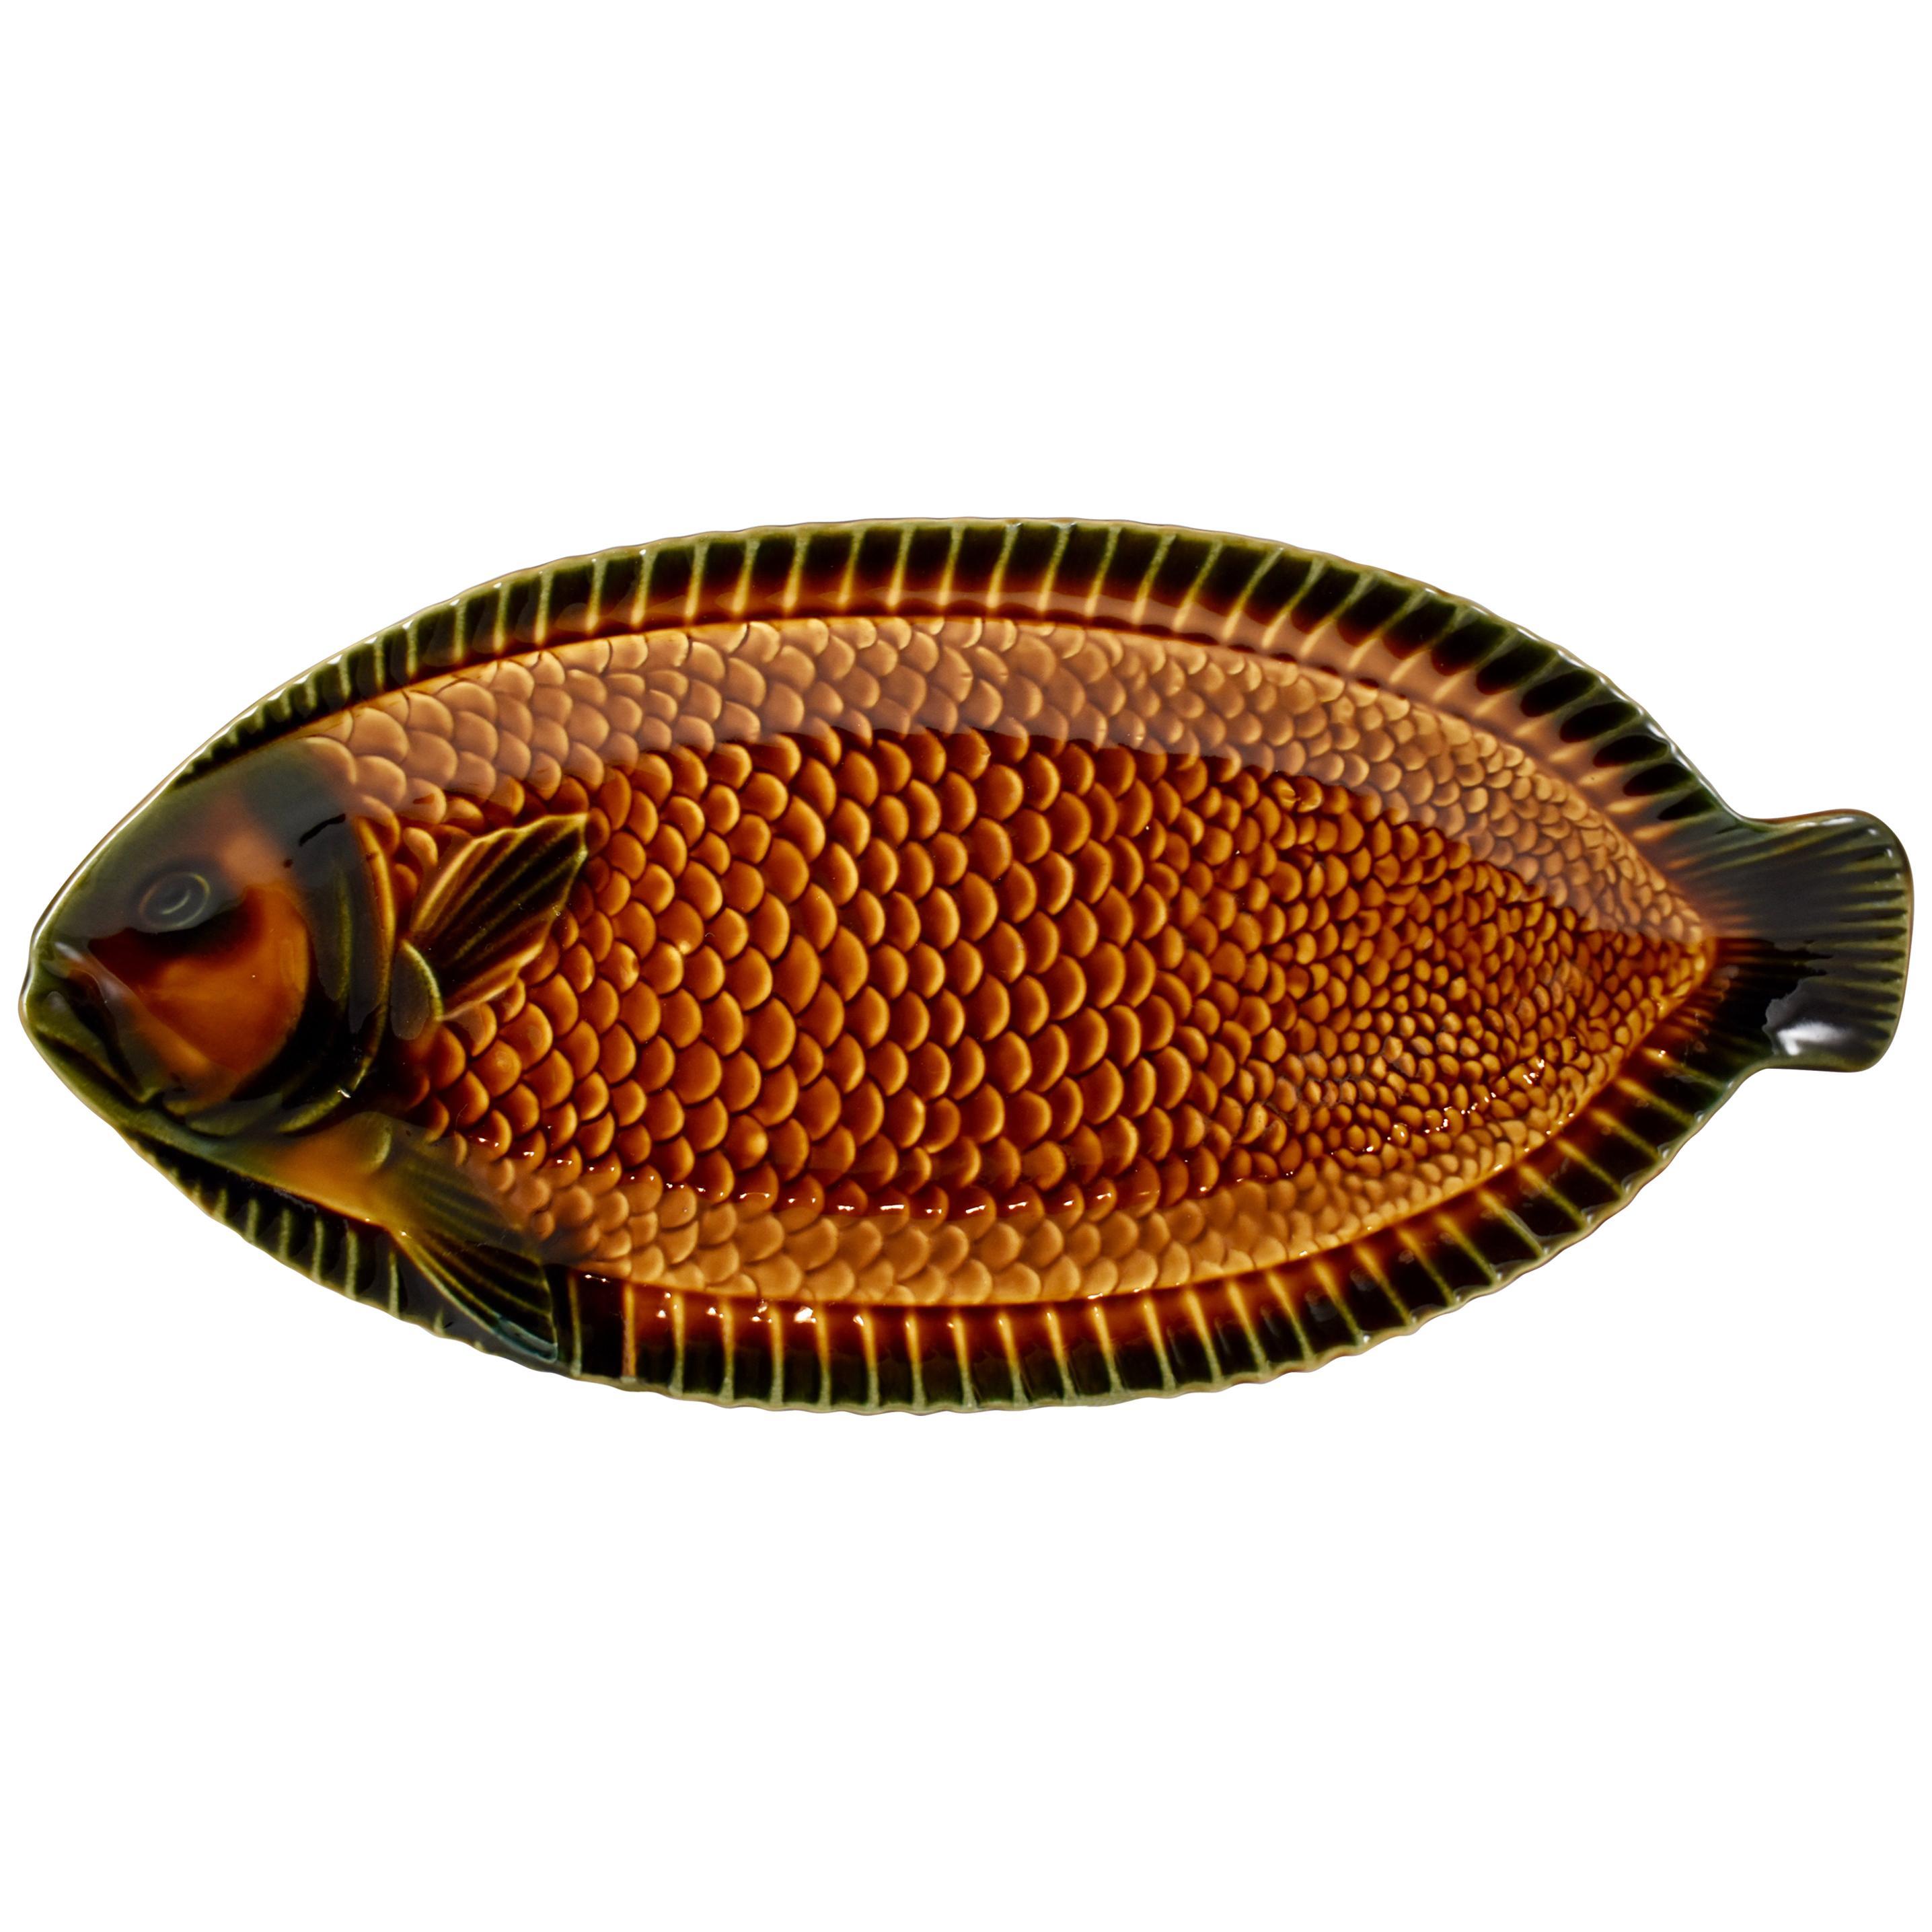 Sarreguemines Mid-Century Era French Faïence Majolica Whole Fish Serving Platter